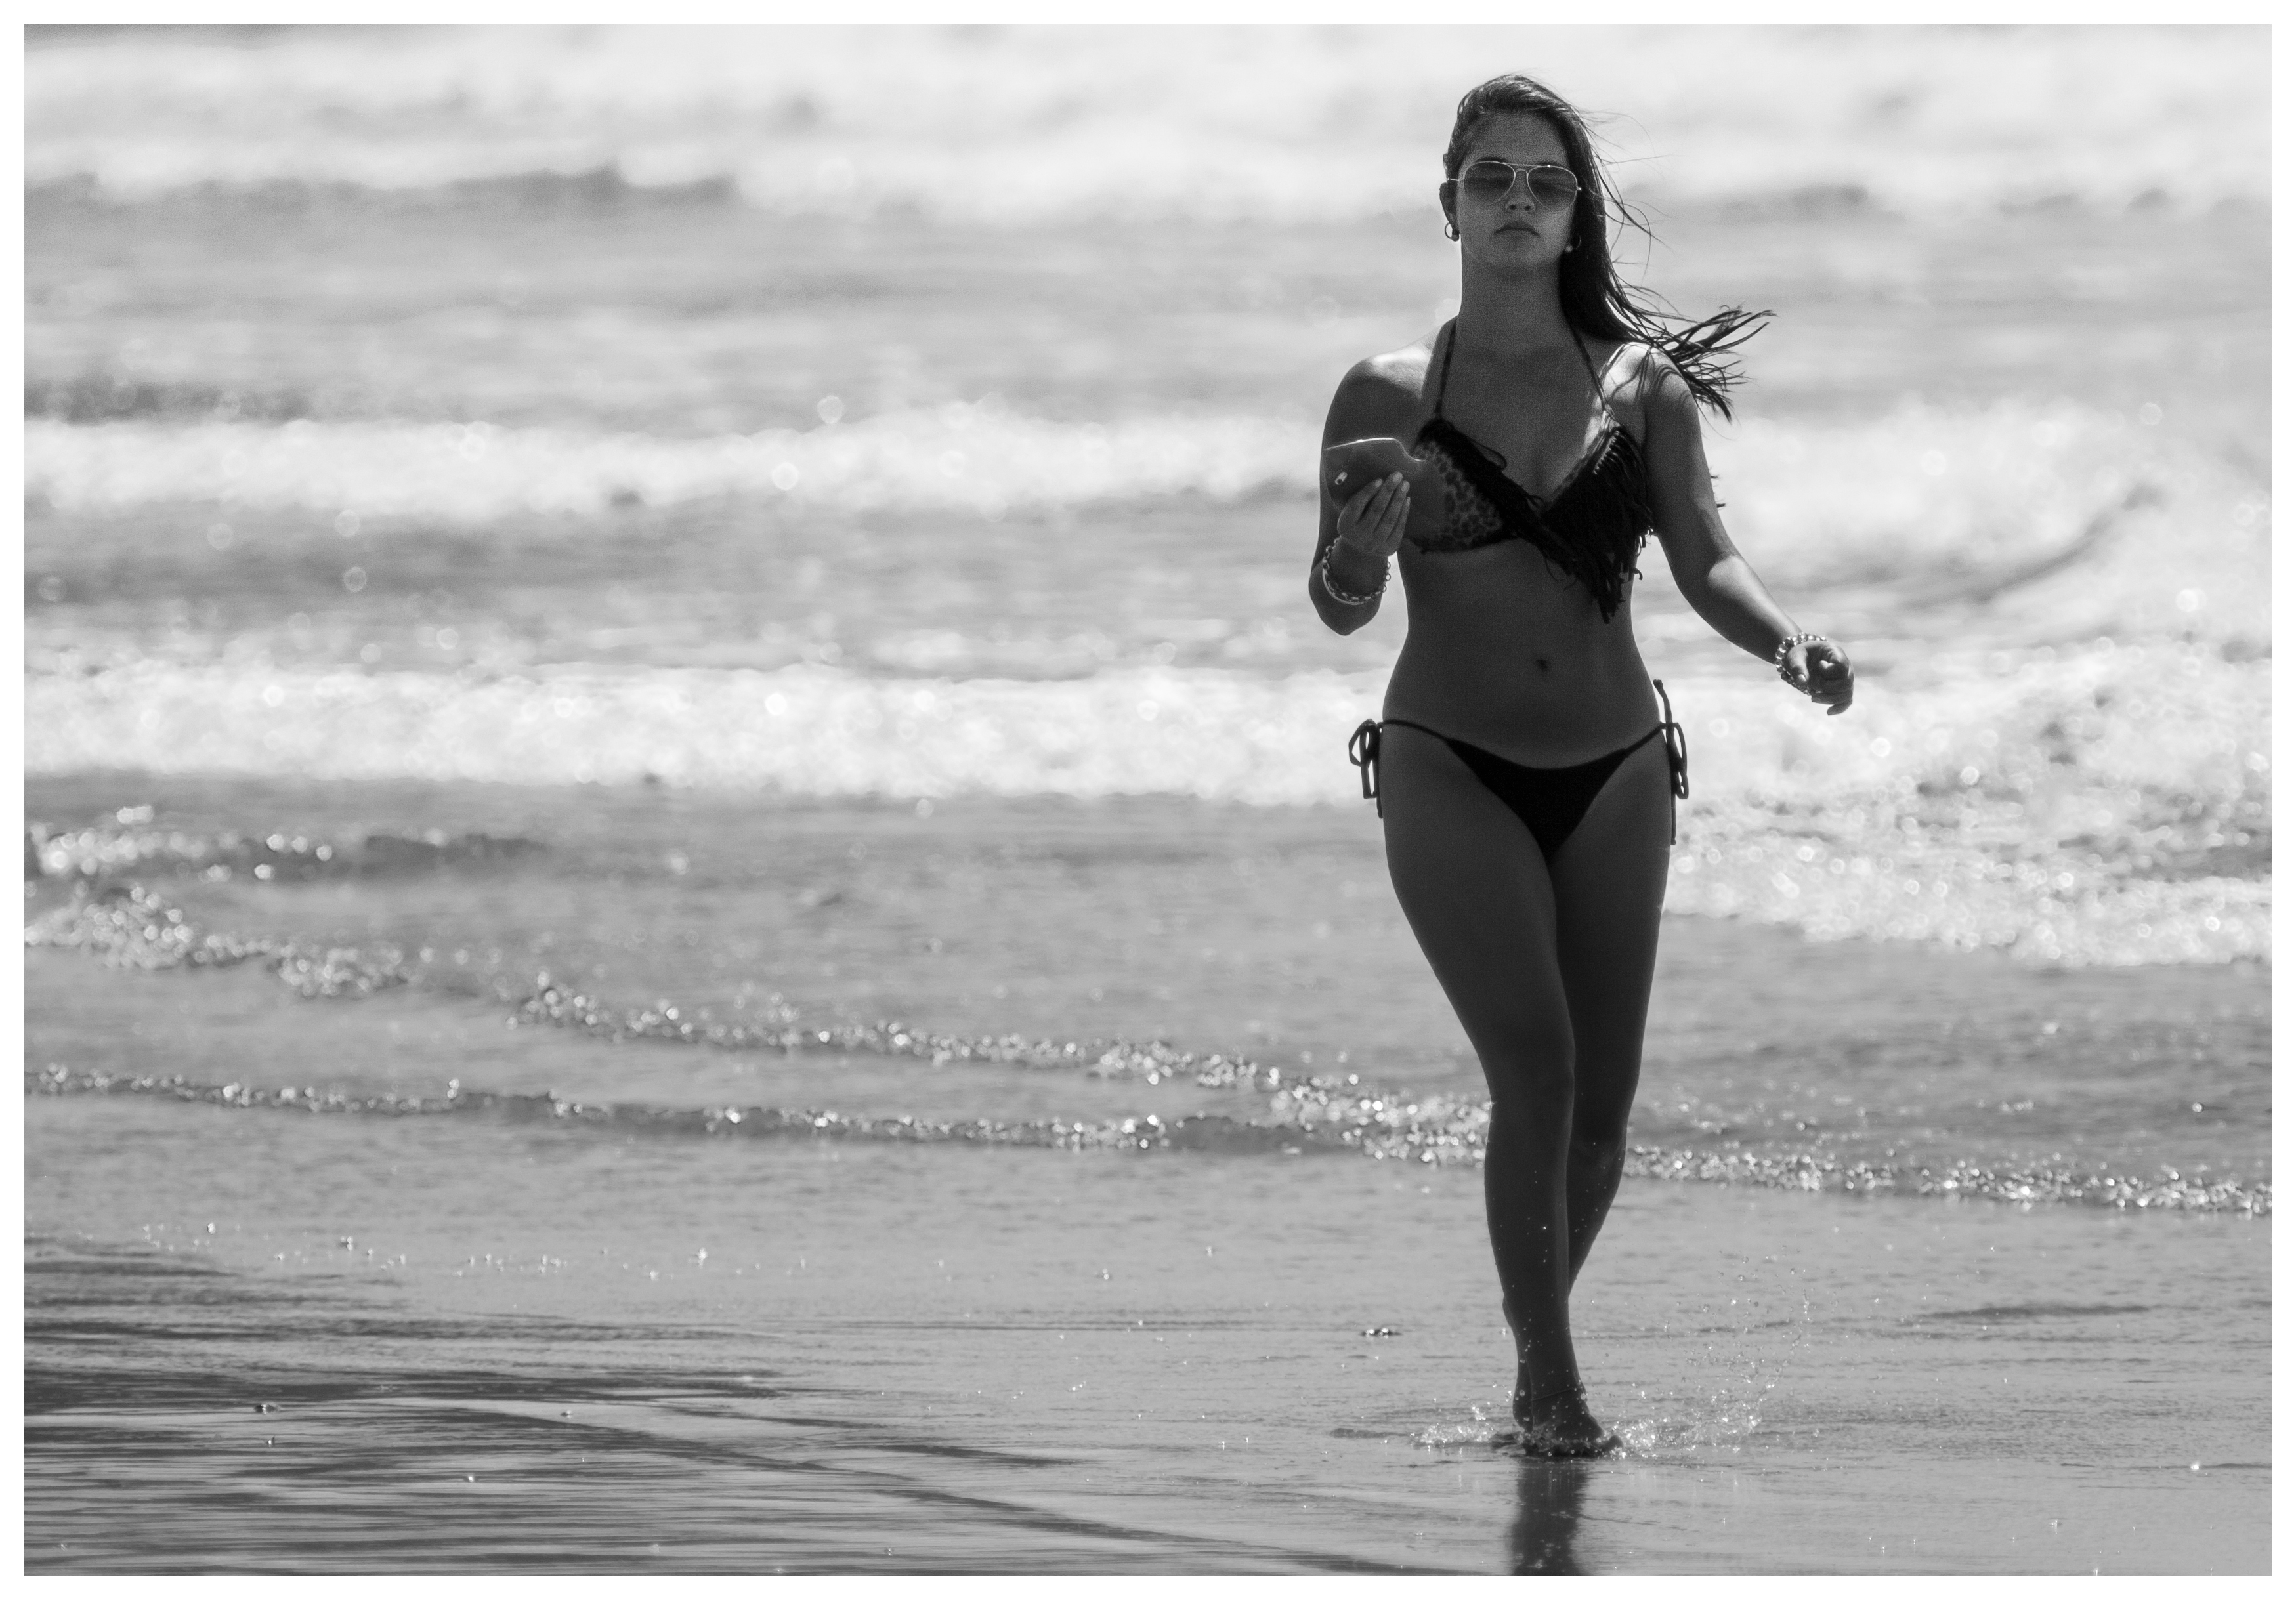 Playa de fin de semana 24133363476_d74e40924f_o